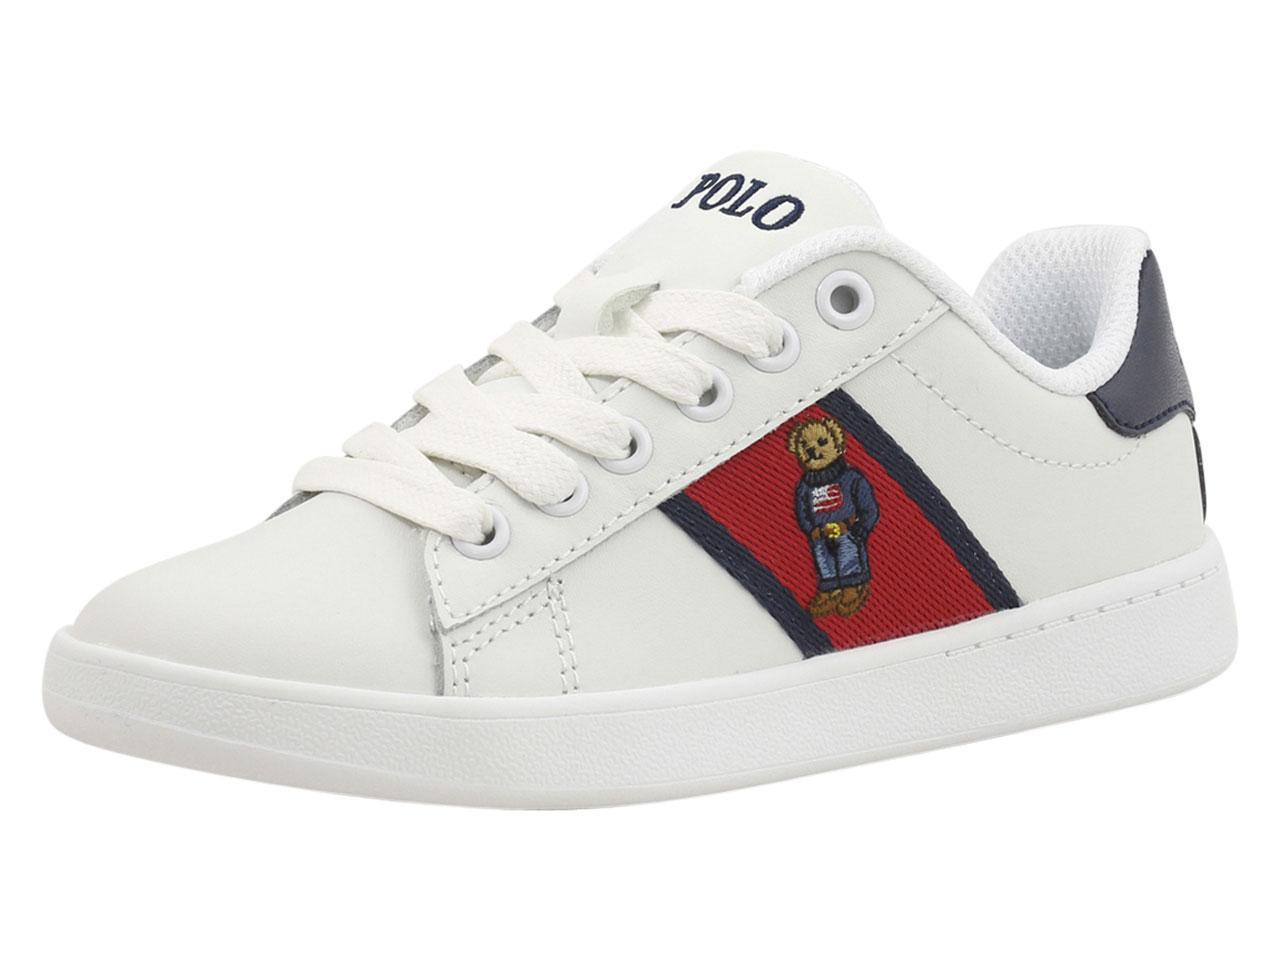 Shoes Polo Sneakers Bear Littlebig Ralph Lauren Quilton Boy's eW9HE2YDI